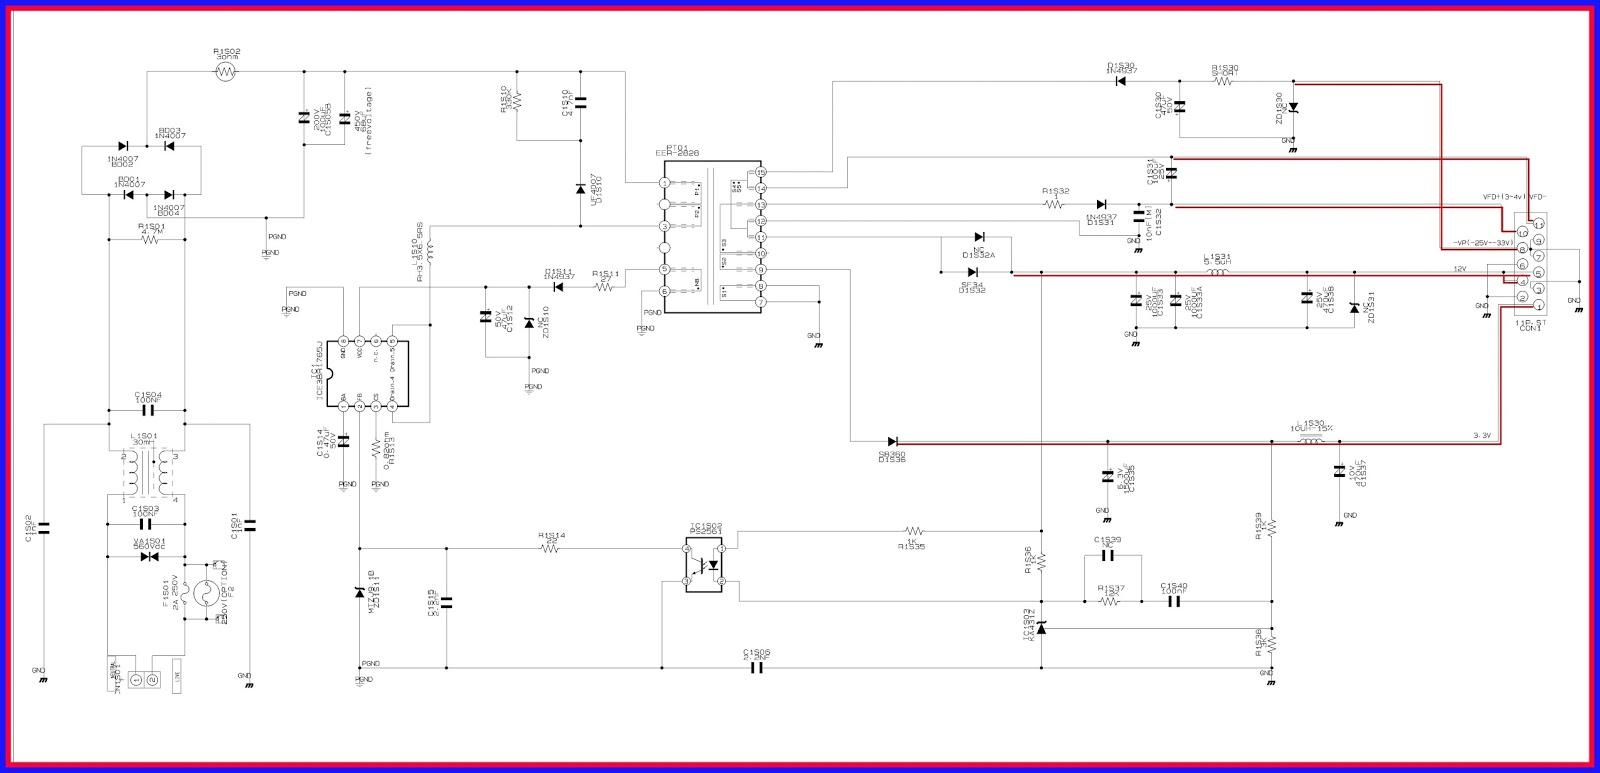 samsung blu ray firmware update bd-c5500